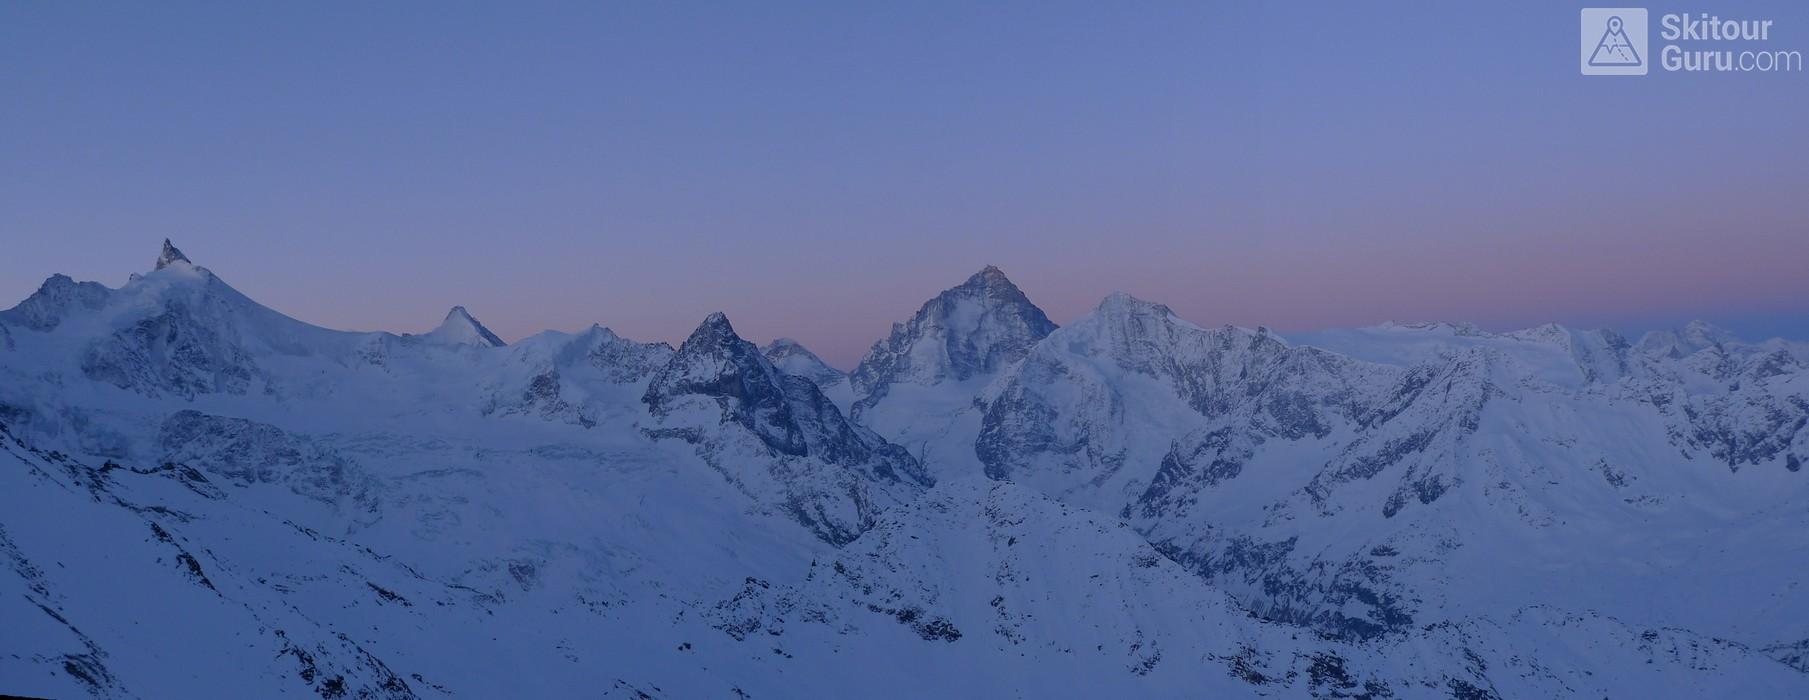 Cabane Tracuit Walliser Alpen / Alpes valaisannes Švýcarsko panorama 20